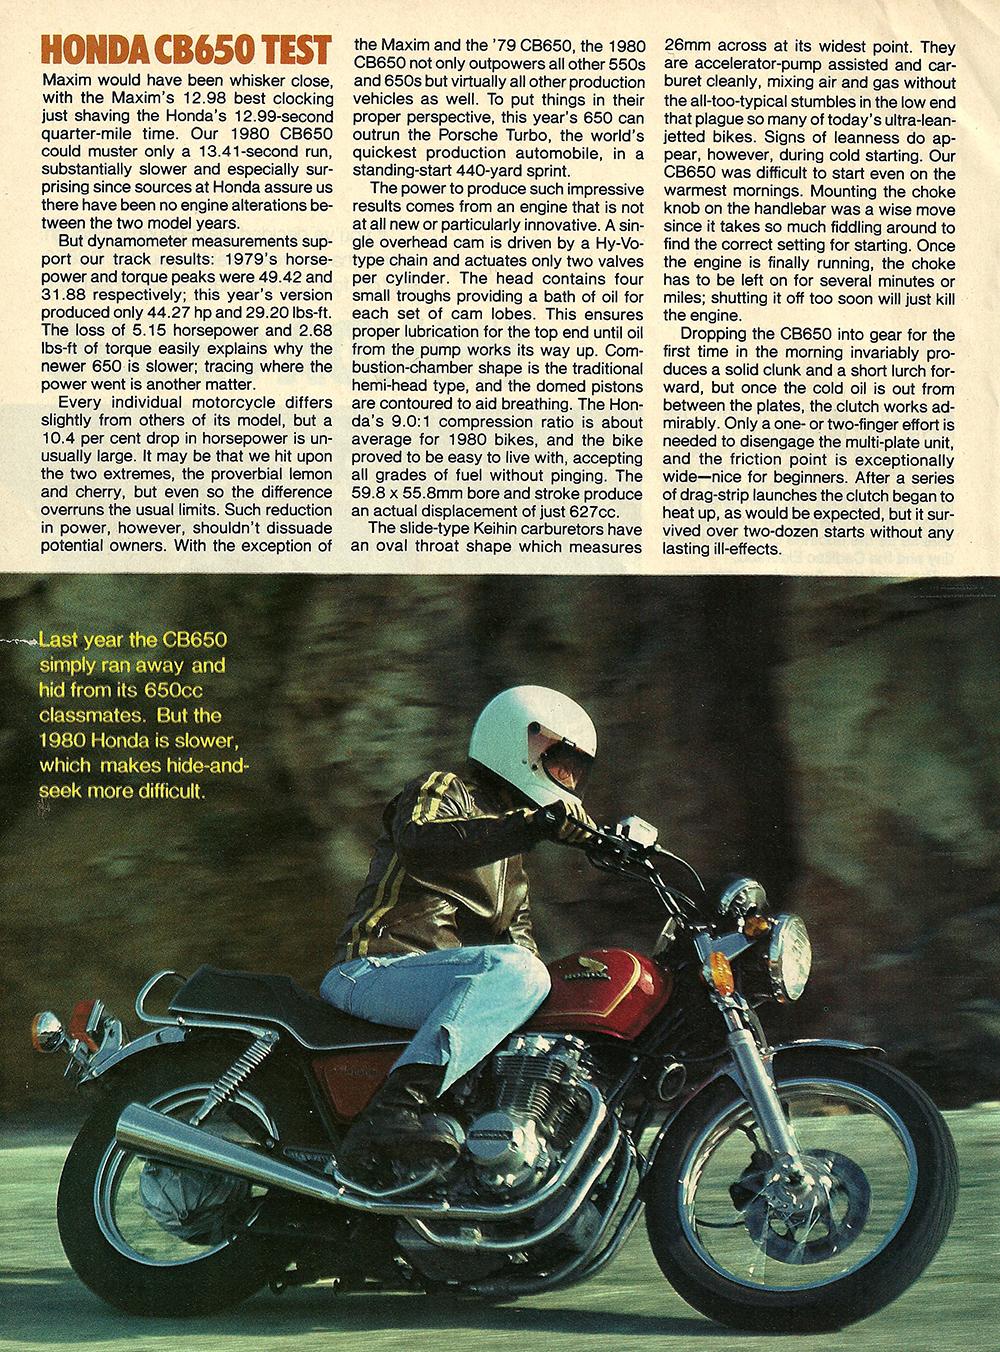 1980 Honda CB650 road test 03.jpg